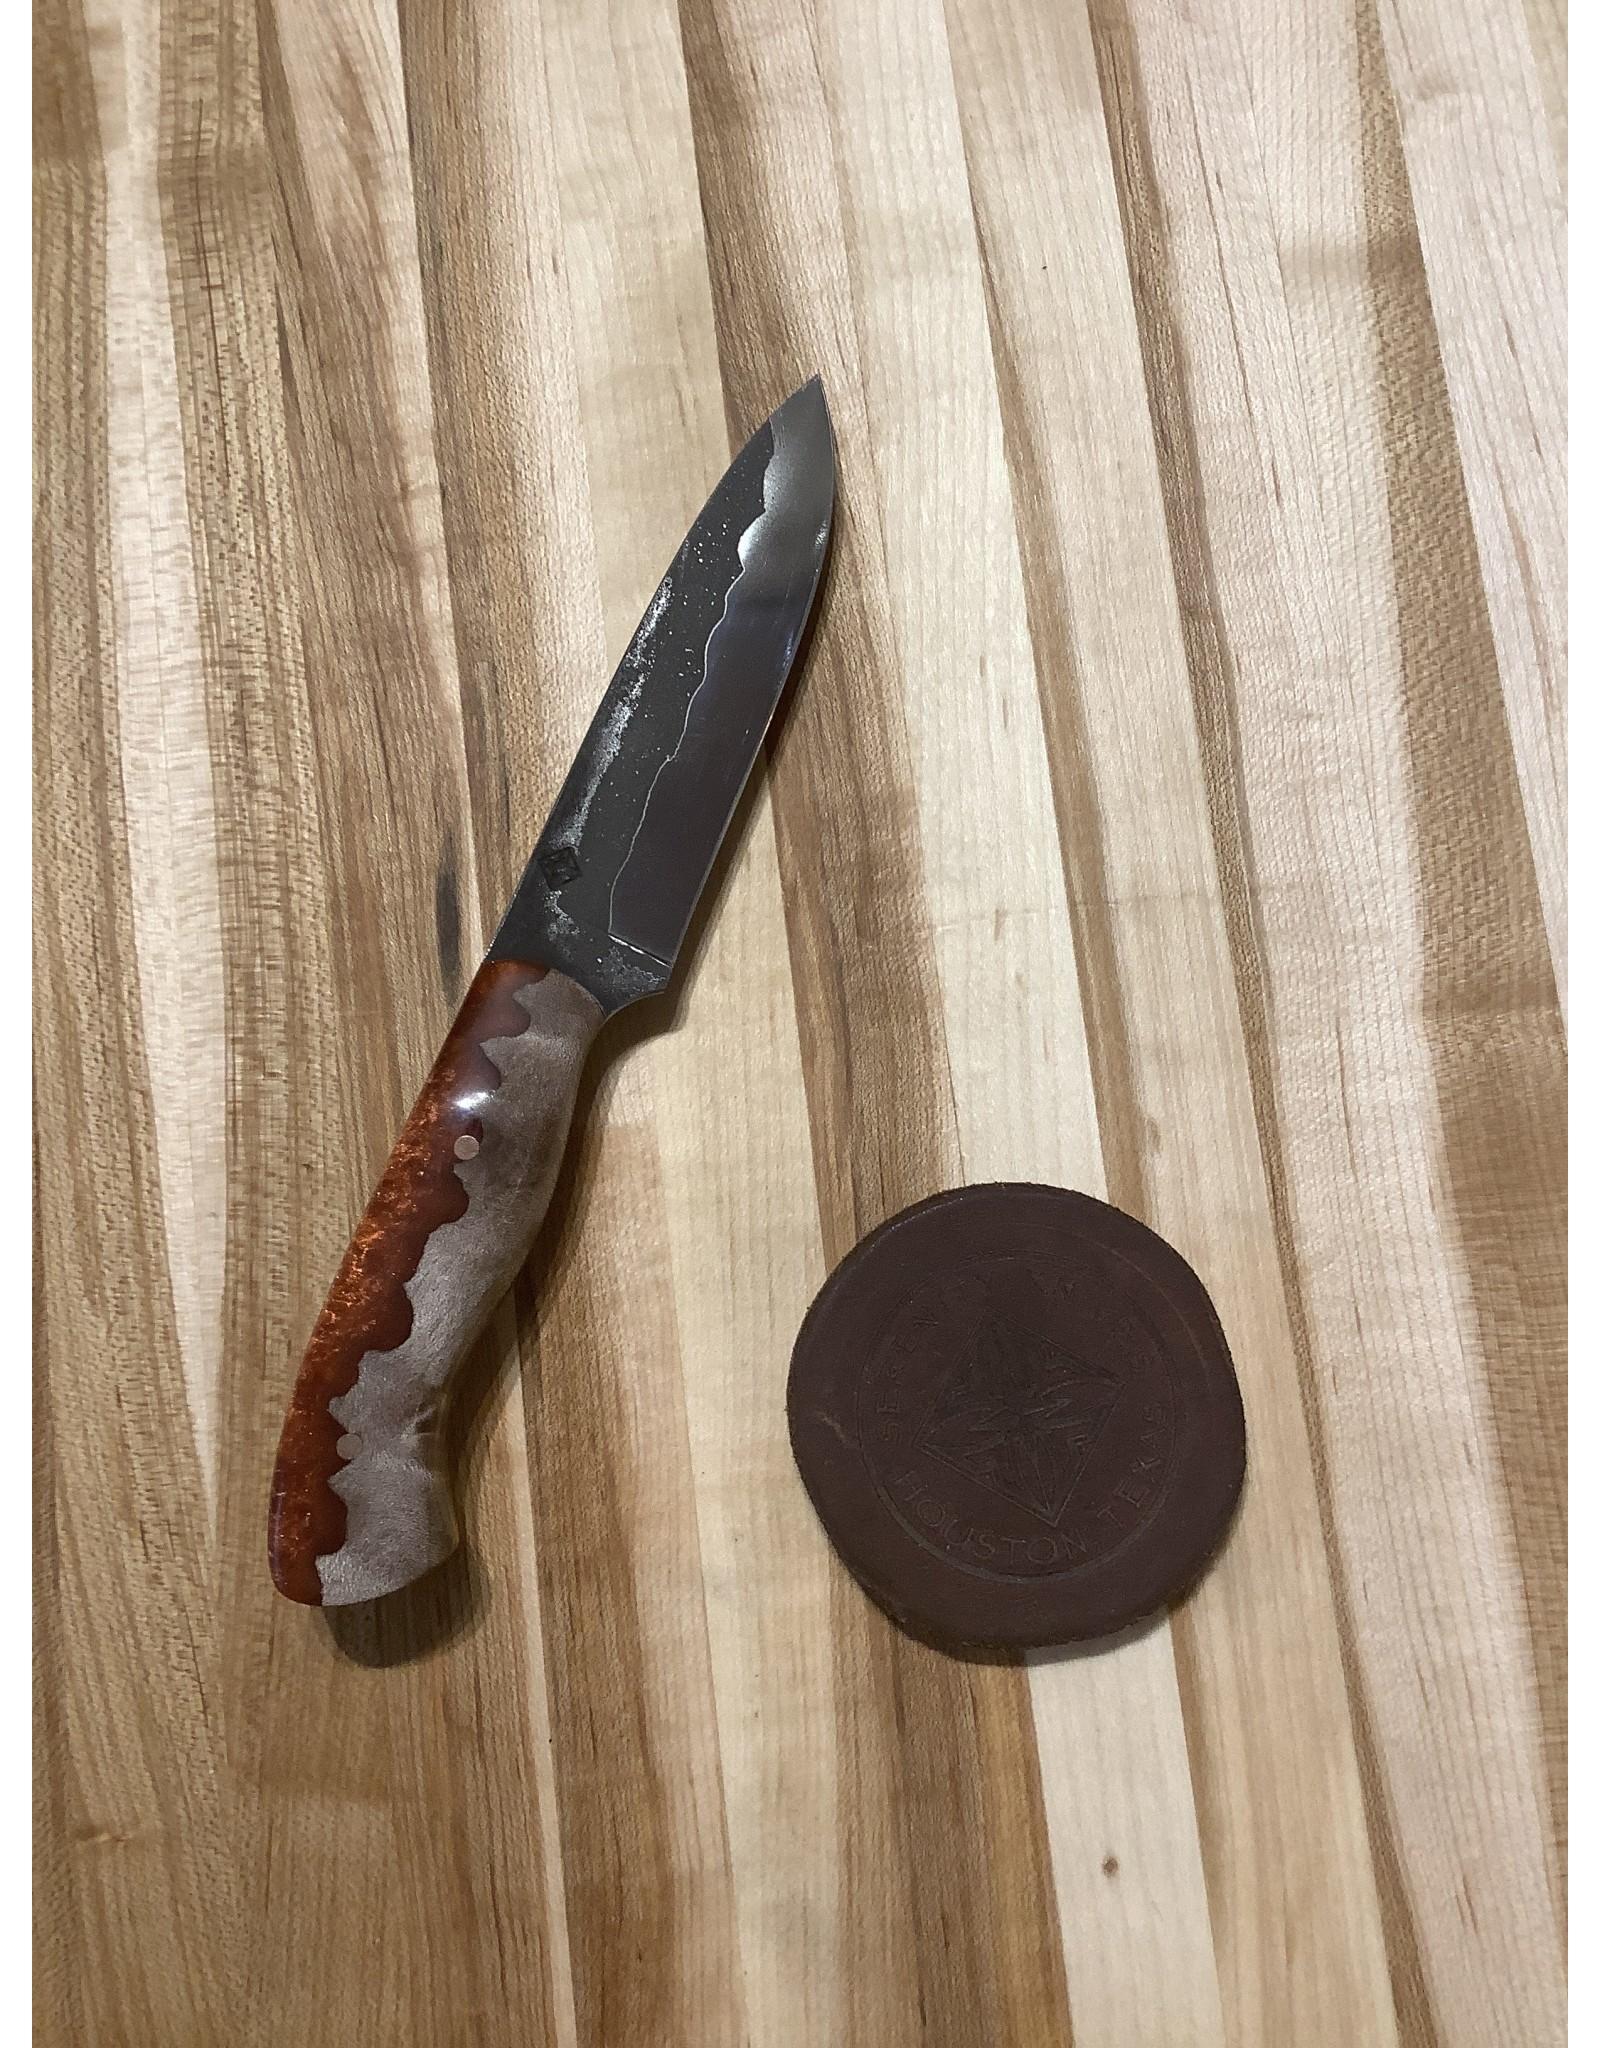 Serenity Set of Three Kitchen Knives